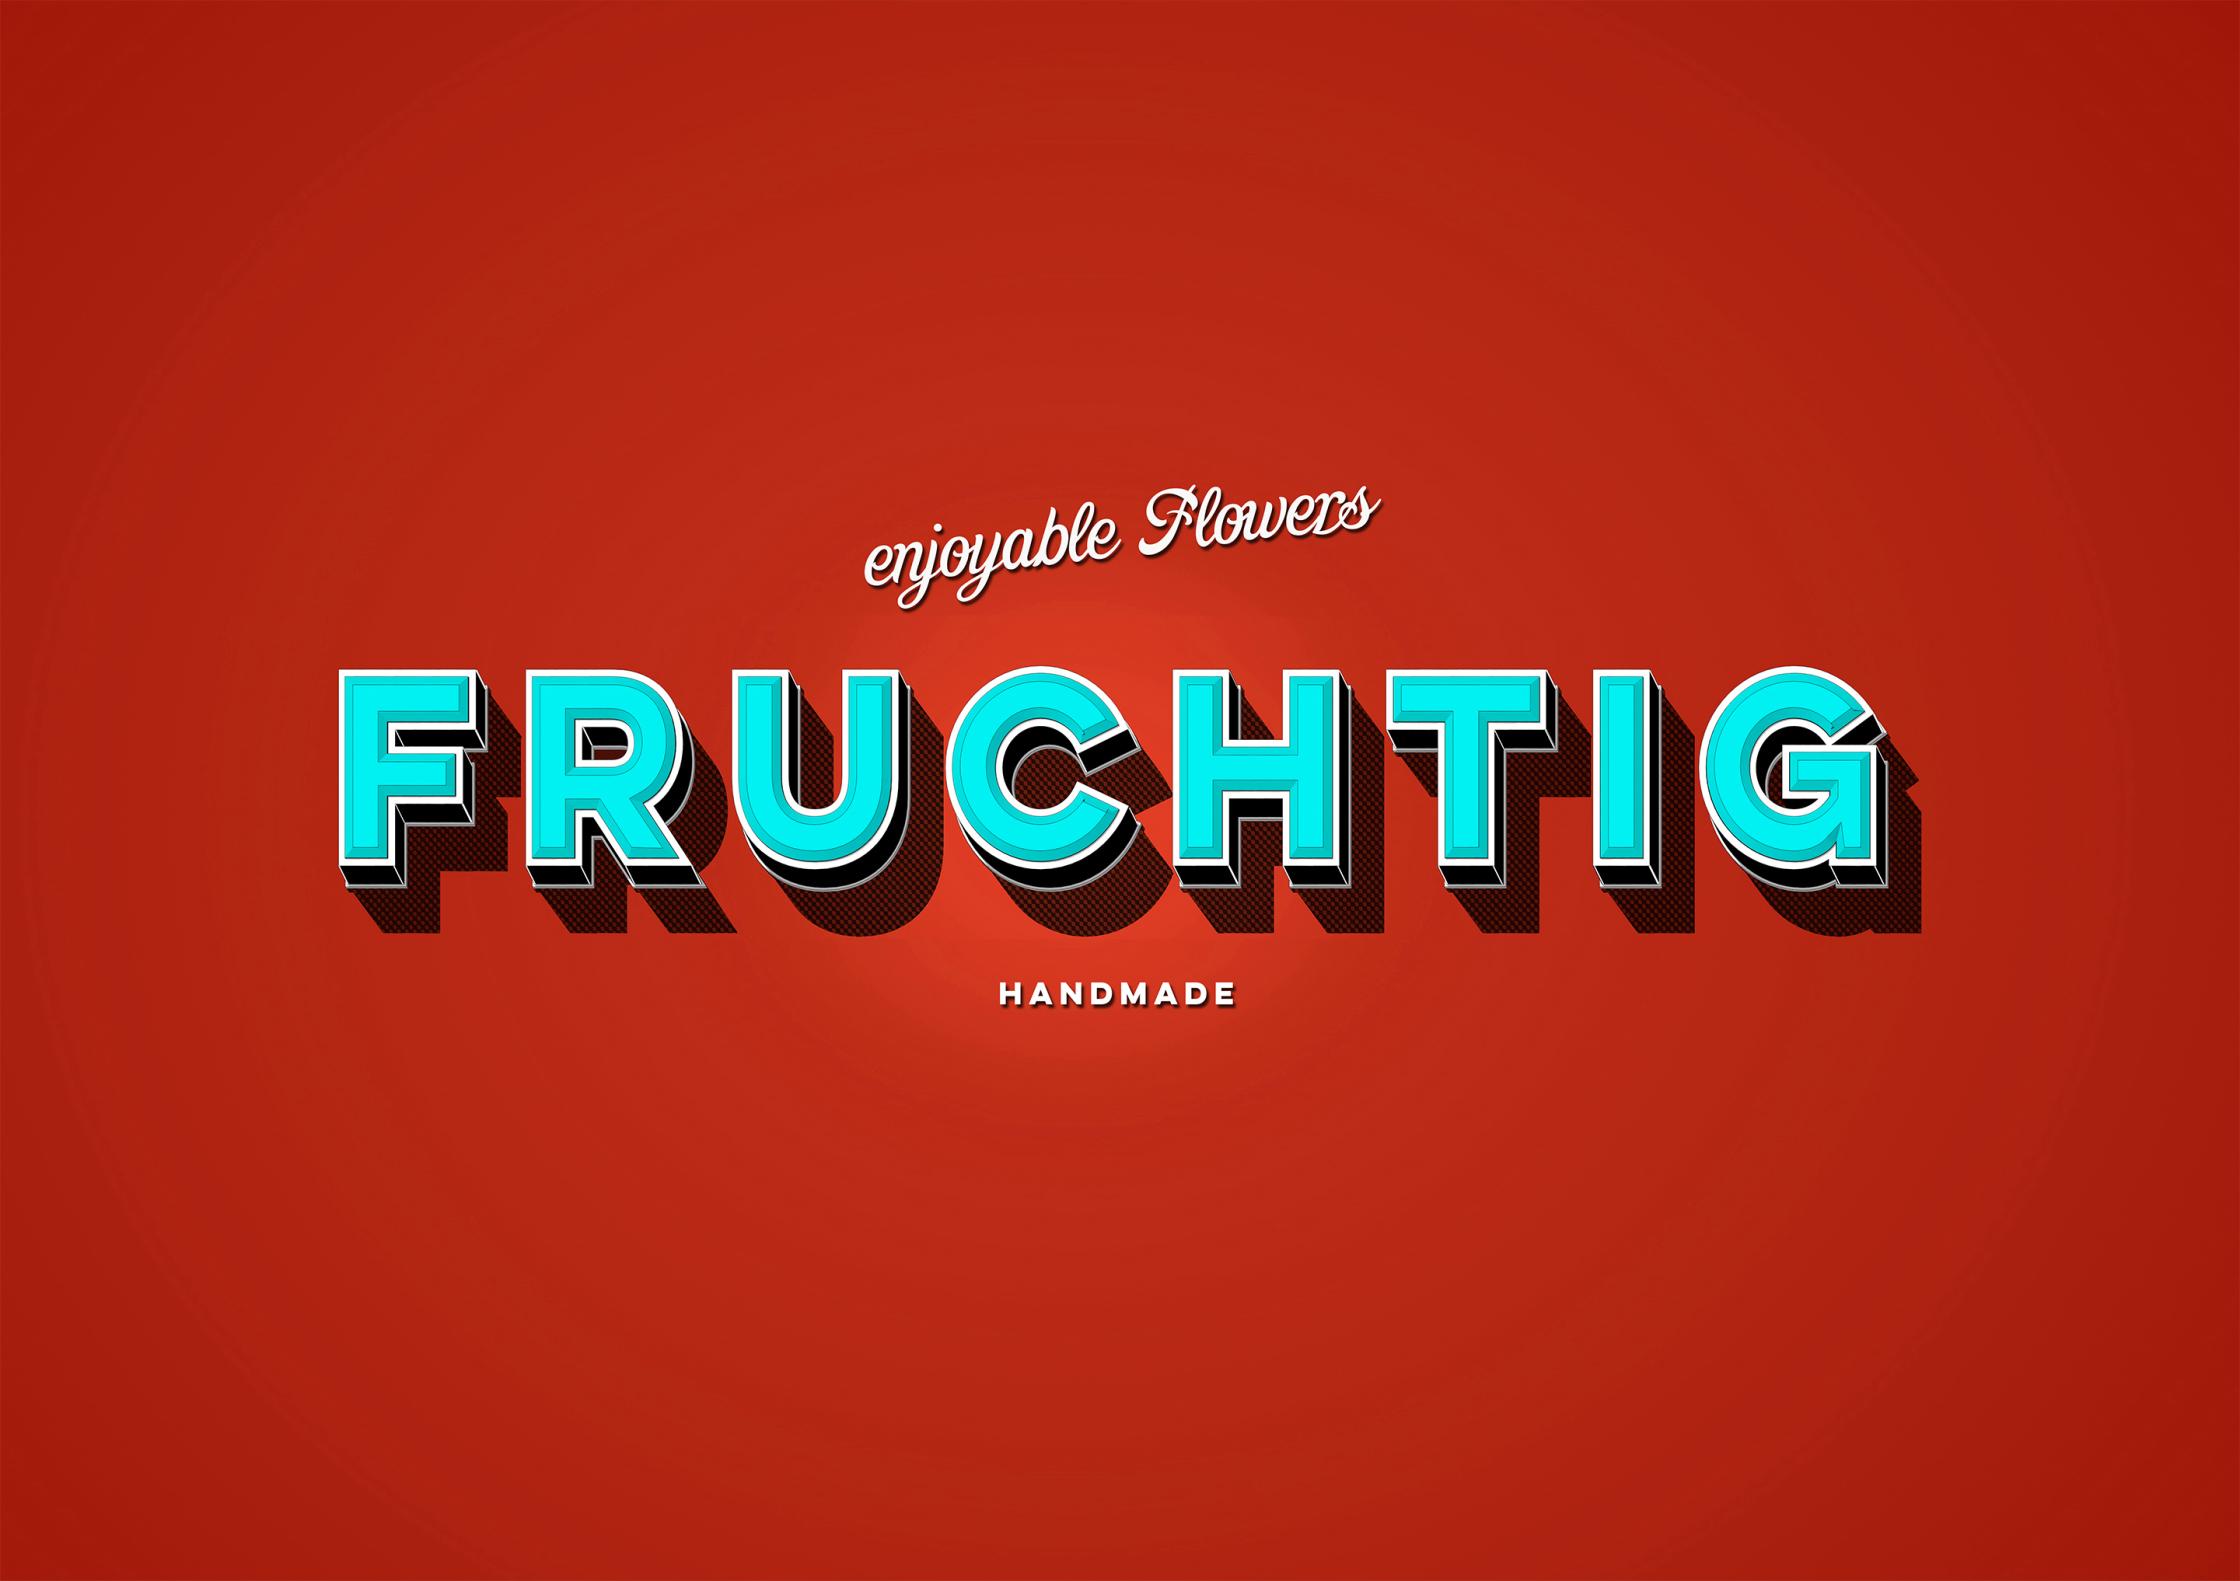 fruchtig_logo.jpg